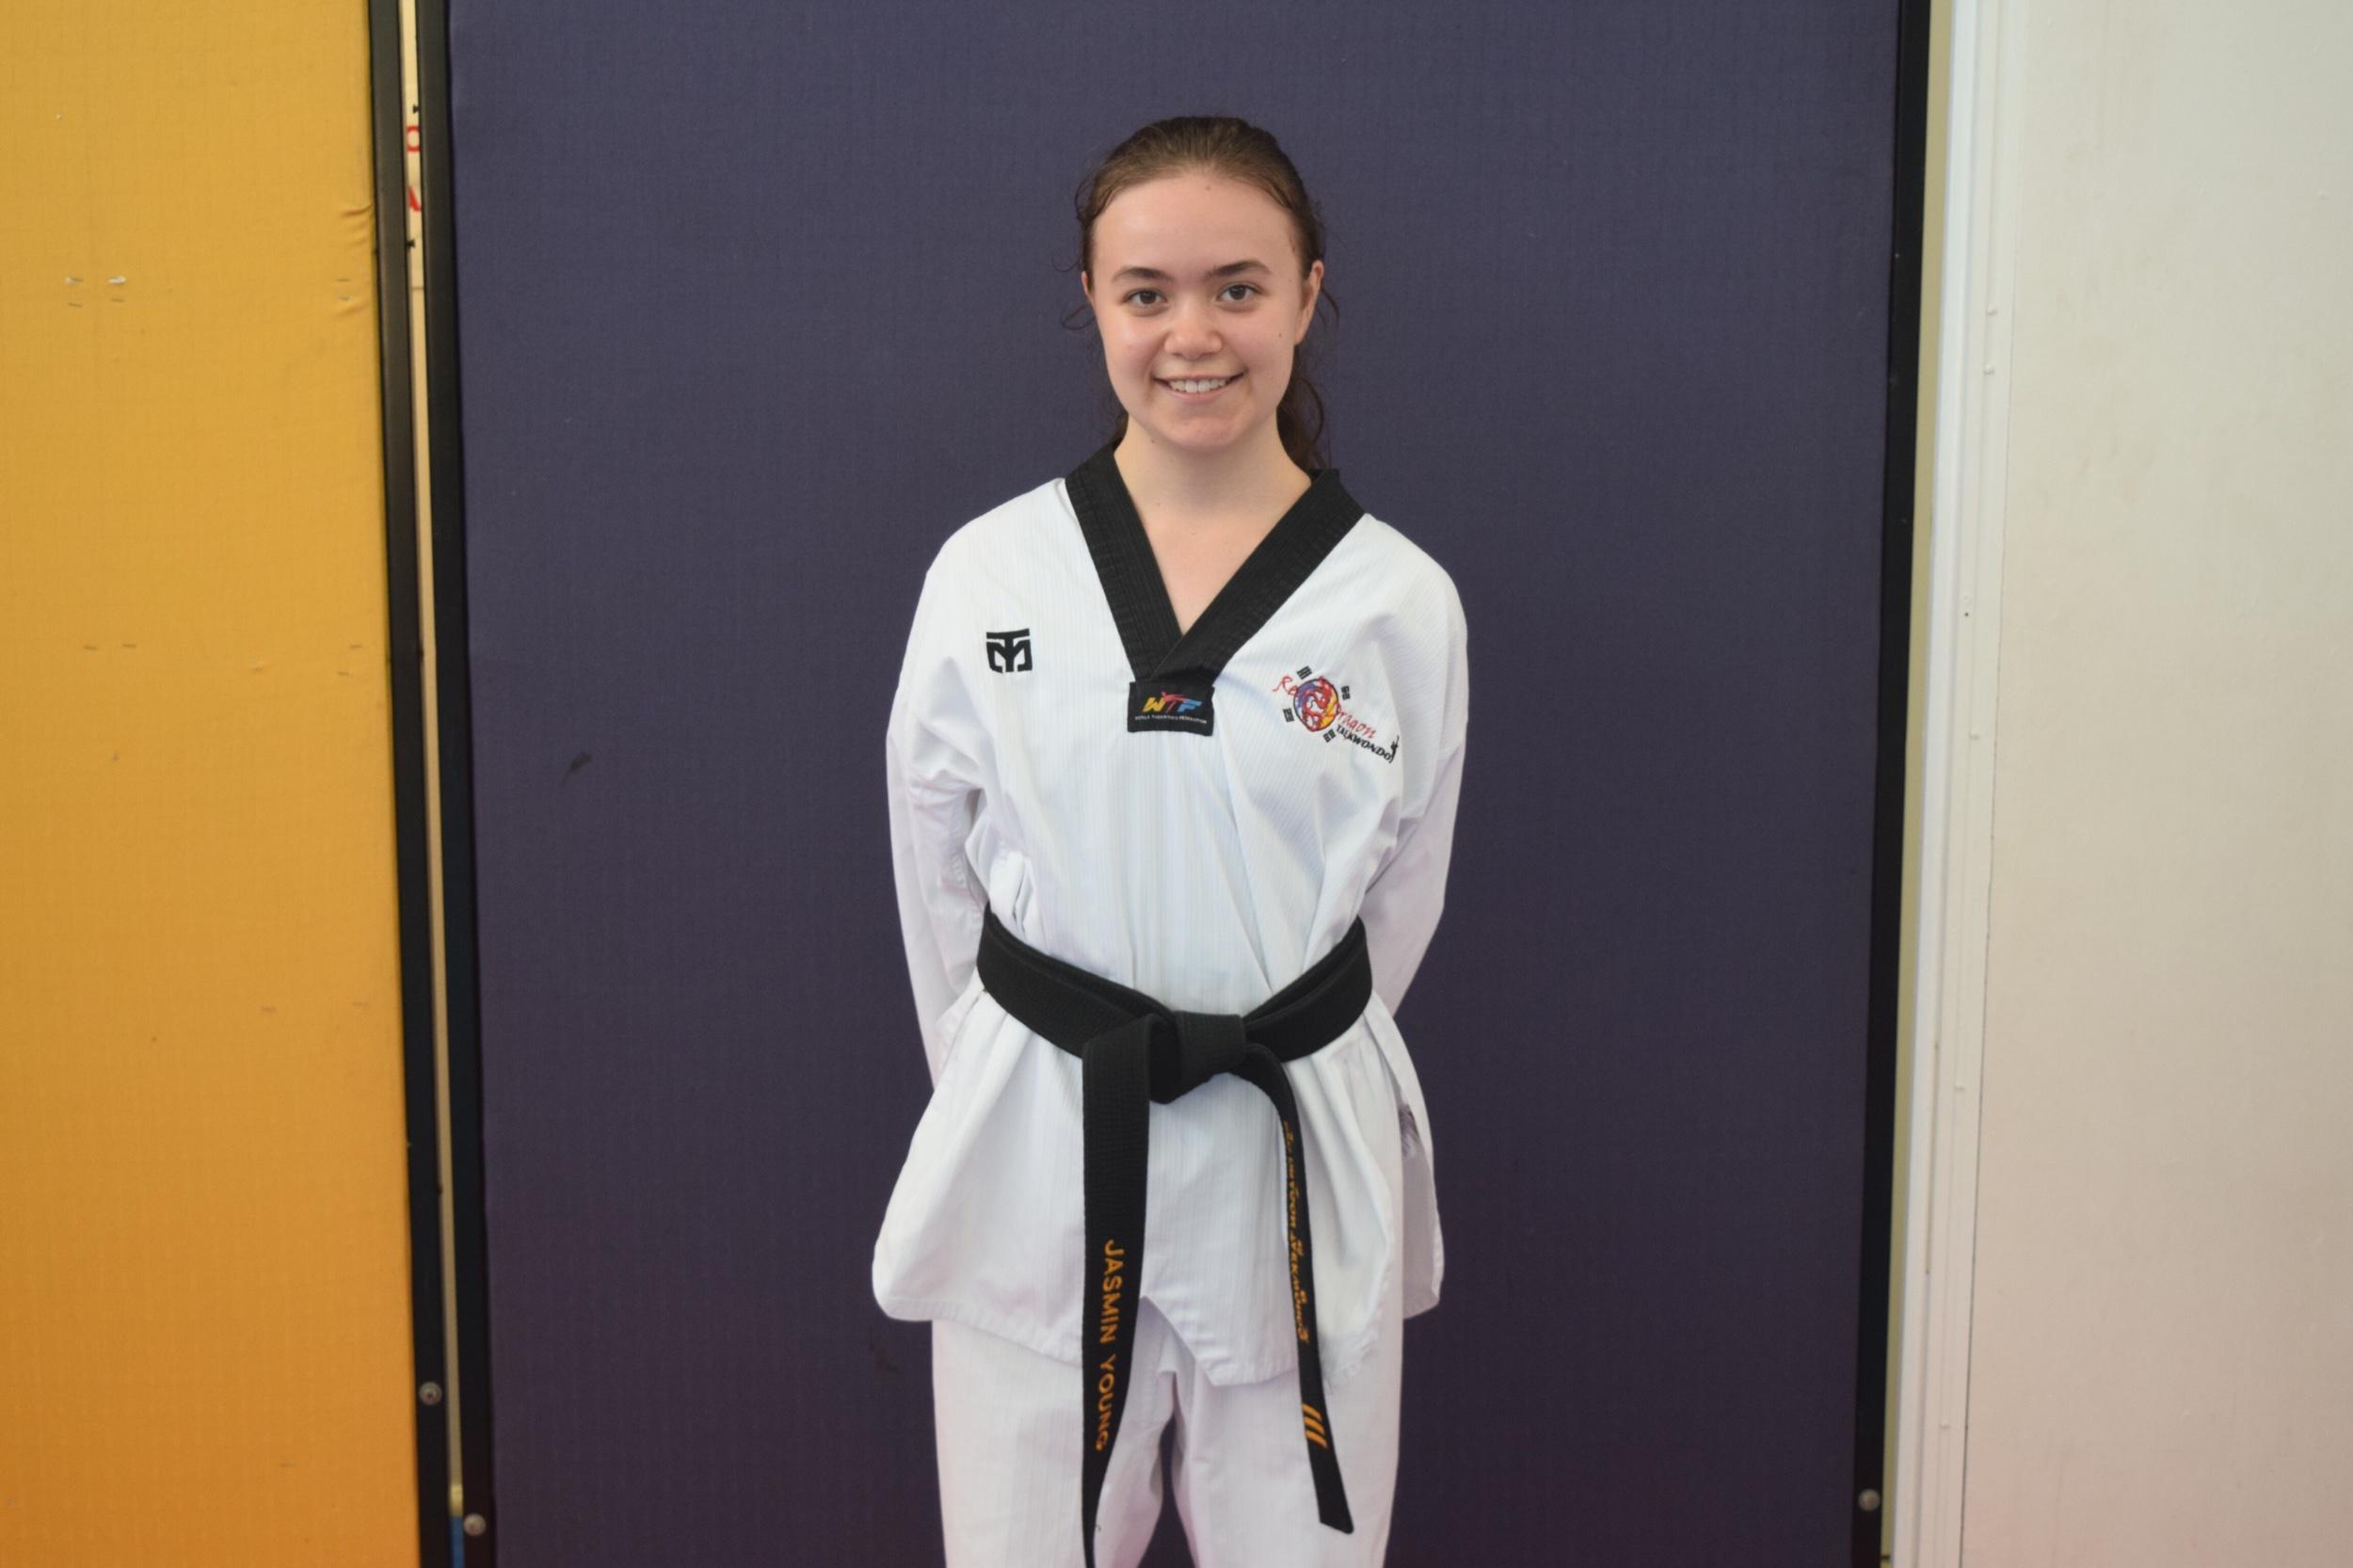 - Assistant InstructorJasmine Youngspecializations3rd dan black belt